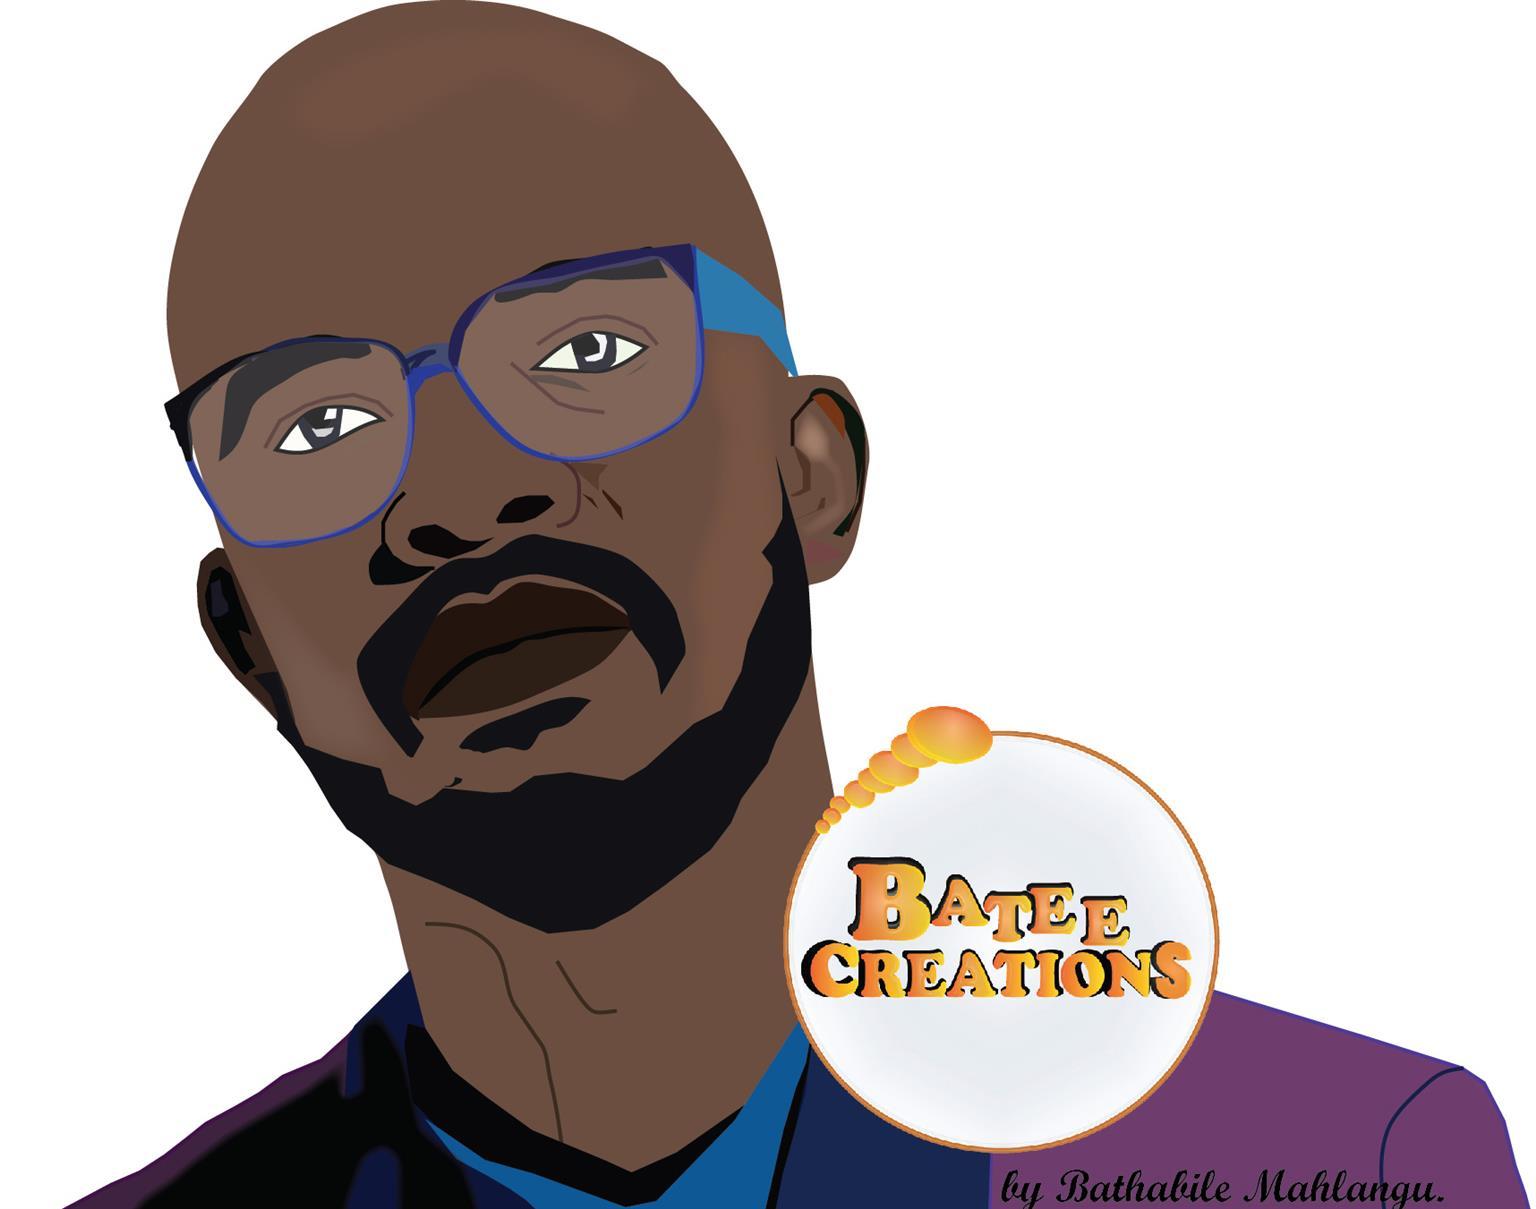 Qualified Graphic Designer, Animator and Video Editor